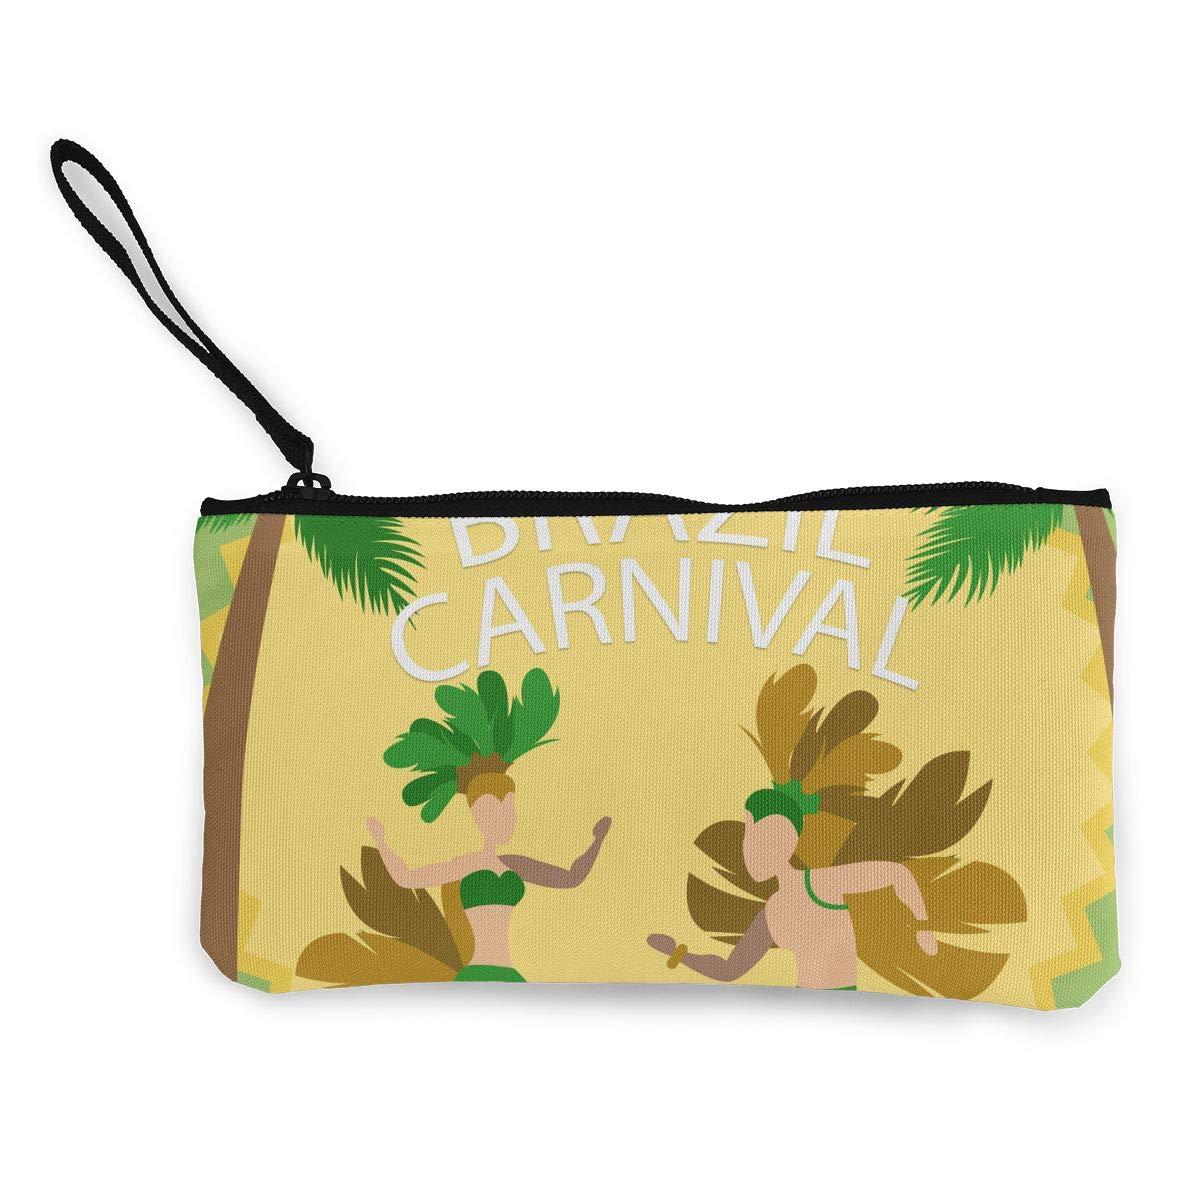 Maple Memories Mardi Gras Carnival Masquerade Portable Canvas Coin Purse Change Purse Pouch Mini Wallet Gifts For Women Girls